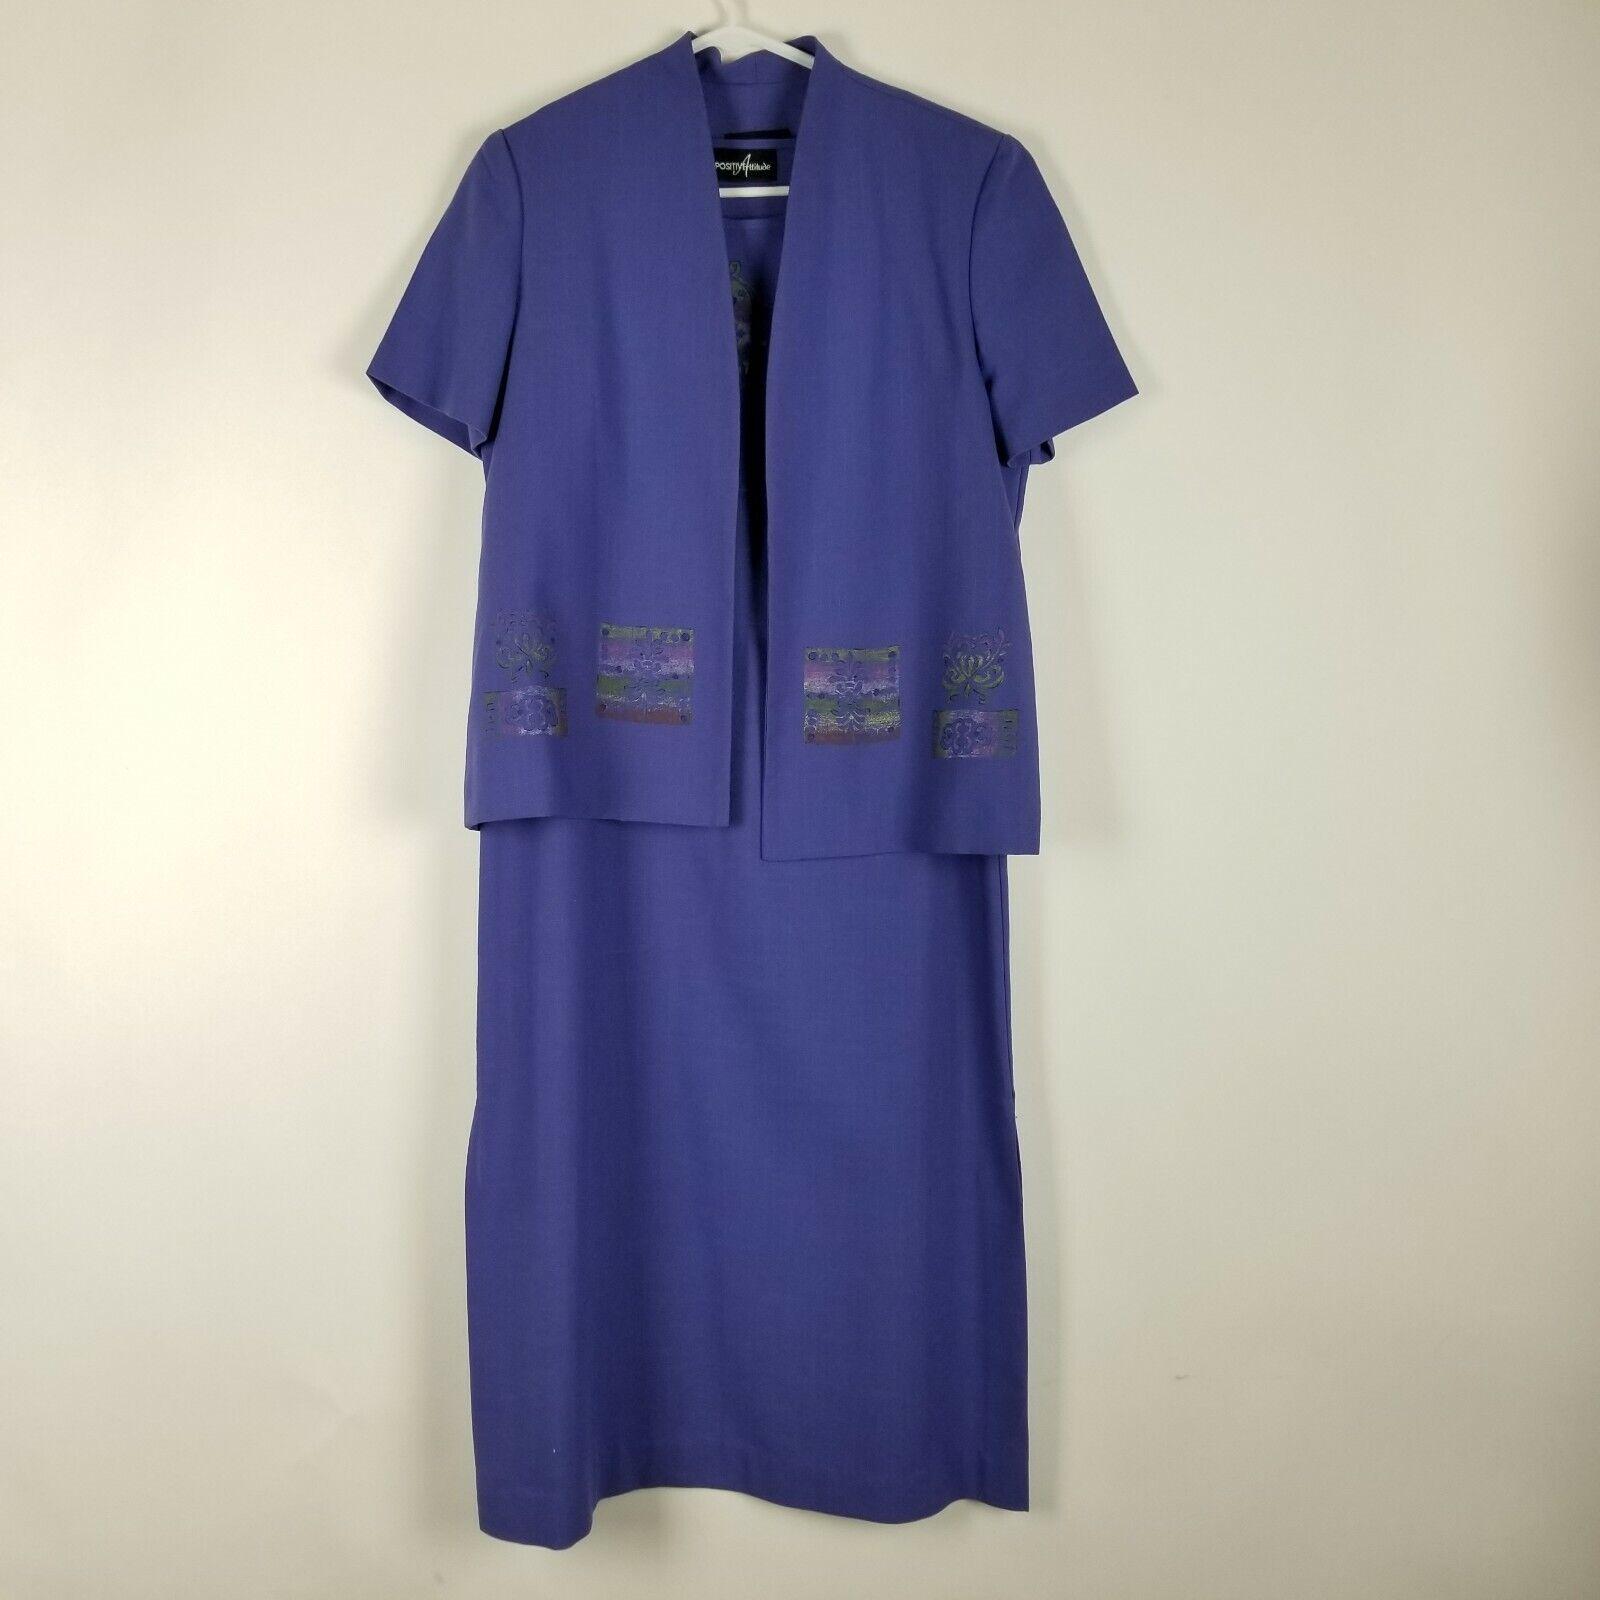 Positive Attitude Women's Dress and Jacket Size 10 Purple Floral Edge Career